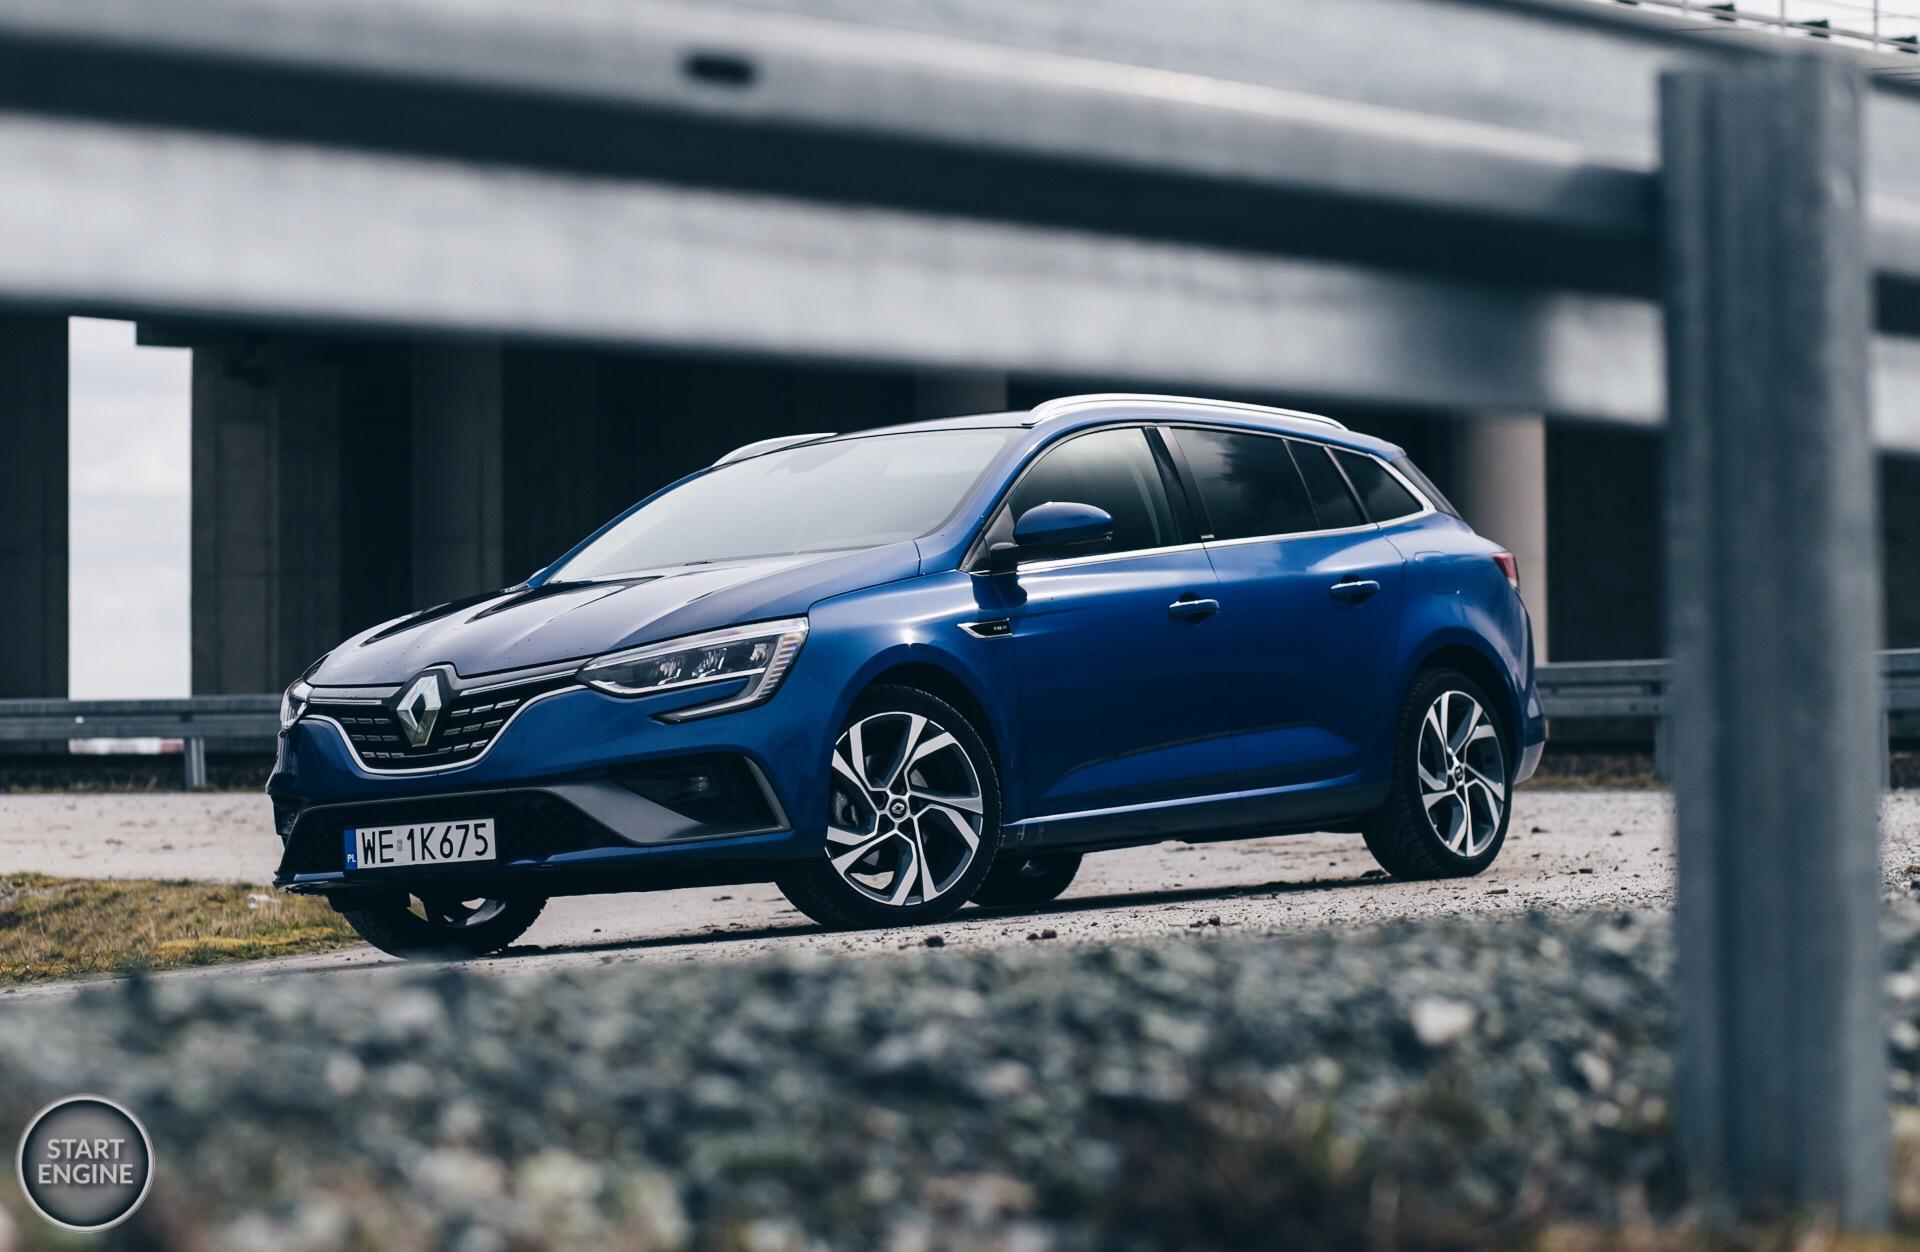 Renault Mégane Grandtour R.S. Line E-TECH